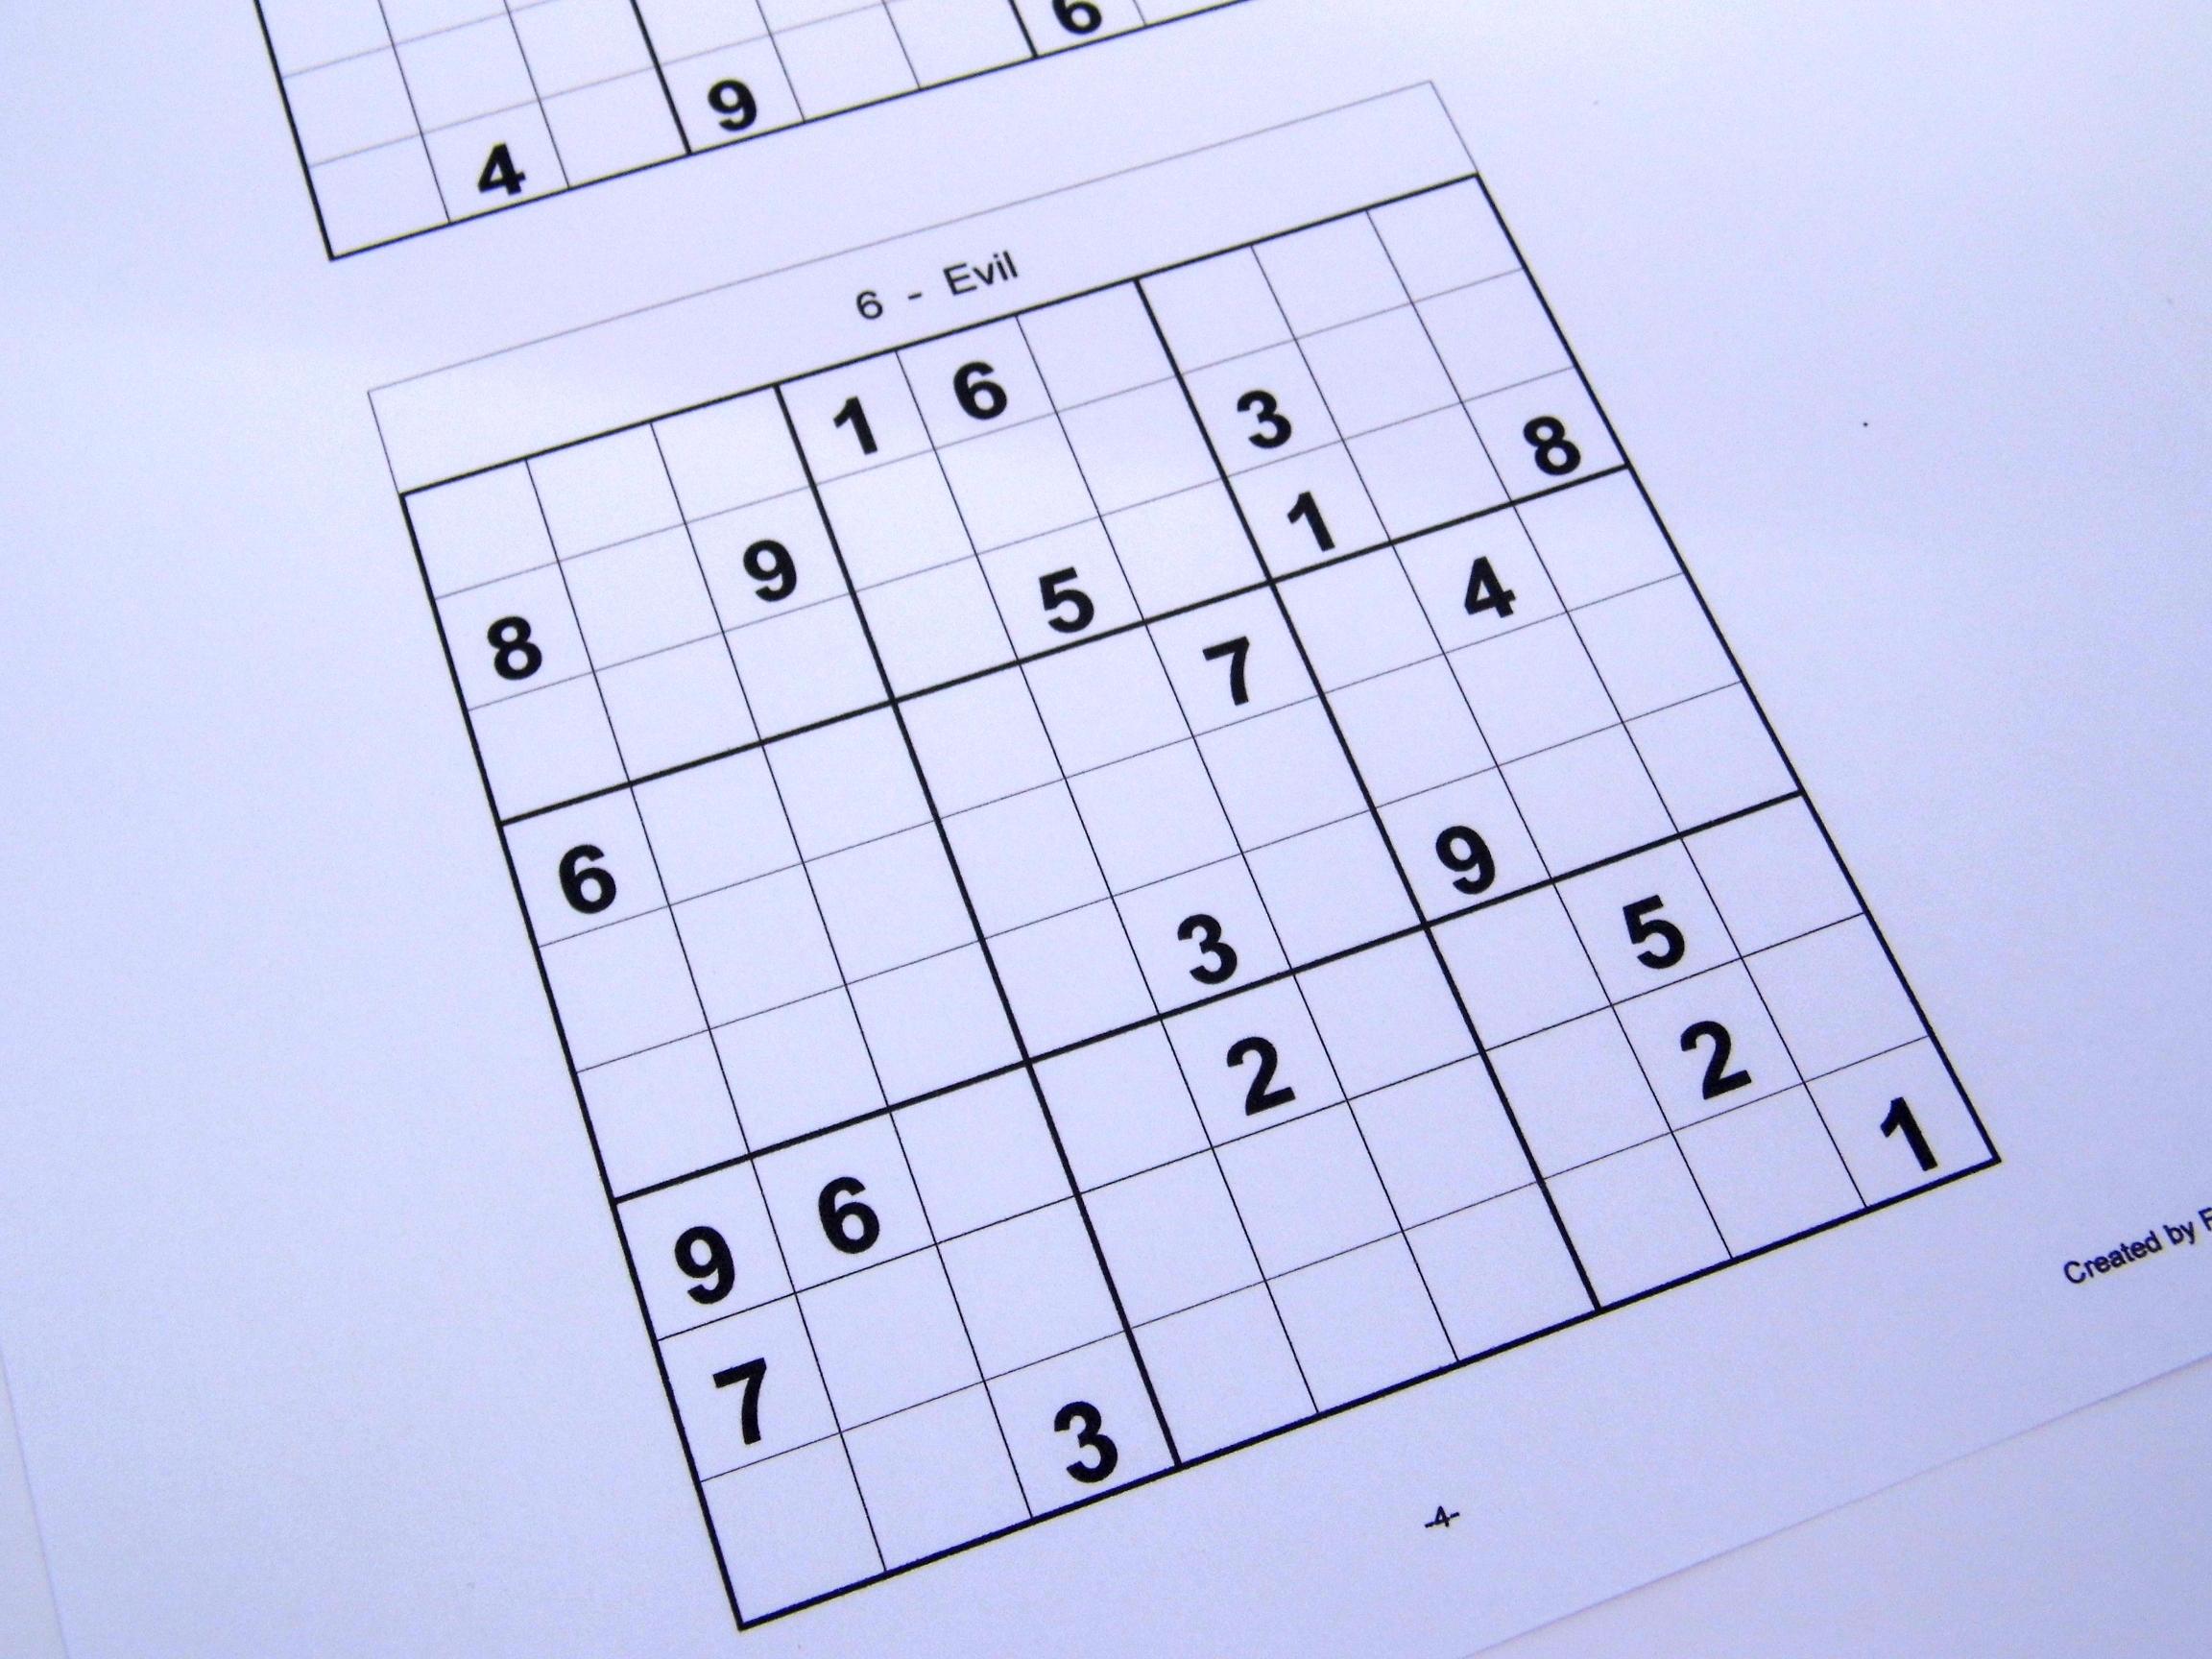 100+ Printable Sudoku Puzzles Pdf – yasminroohi